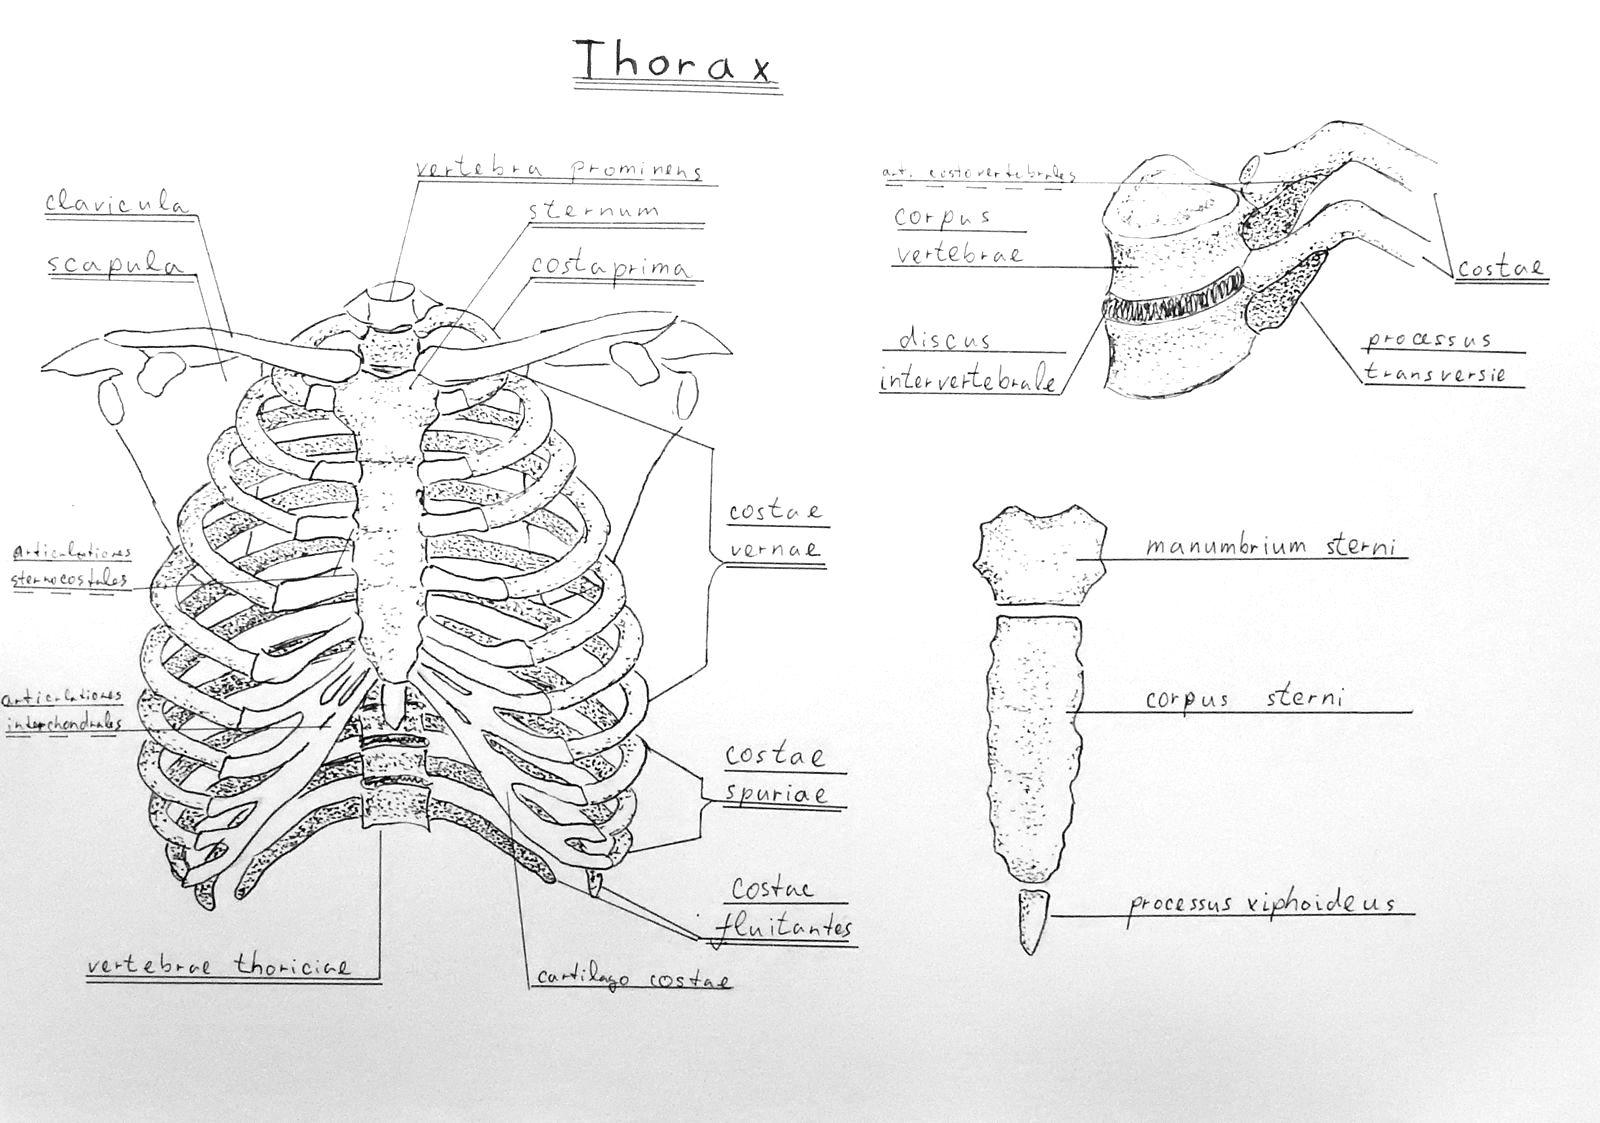 Anatomy Atlas Part 7 - Rib Cage